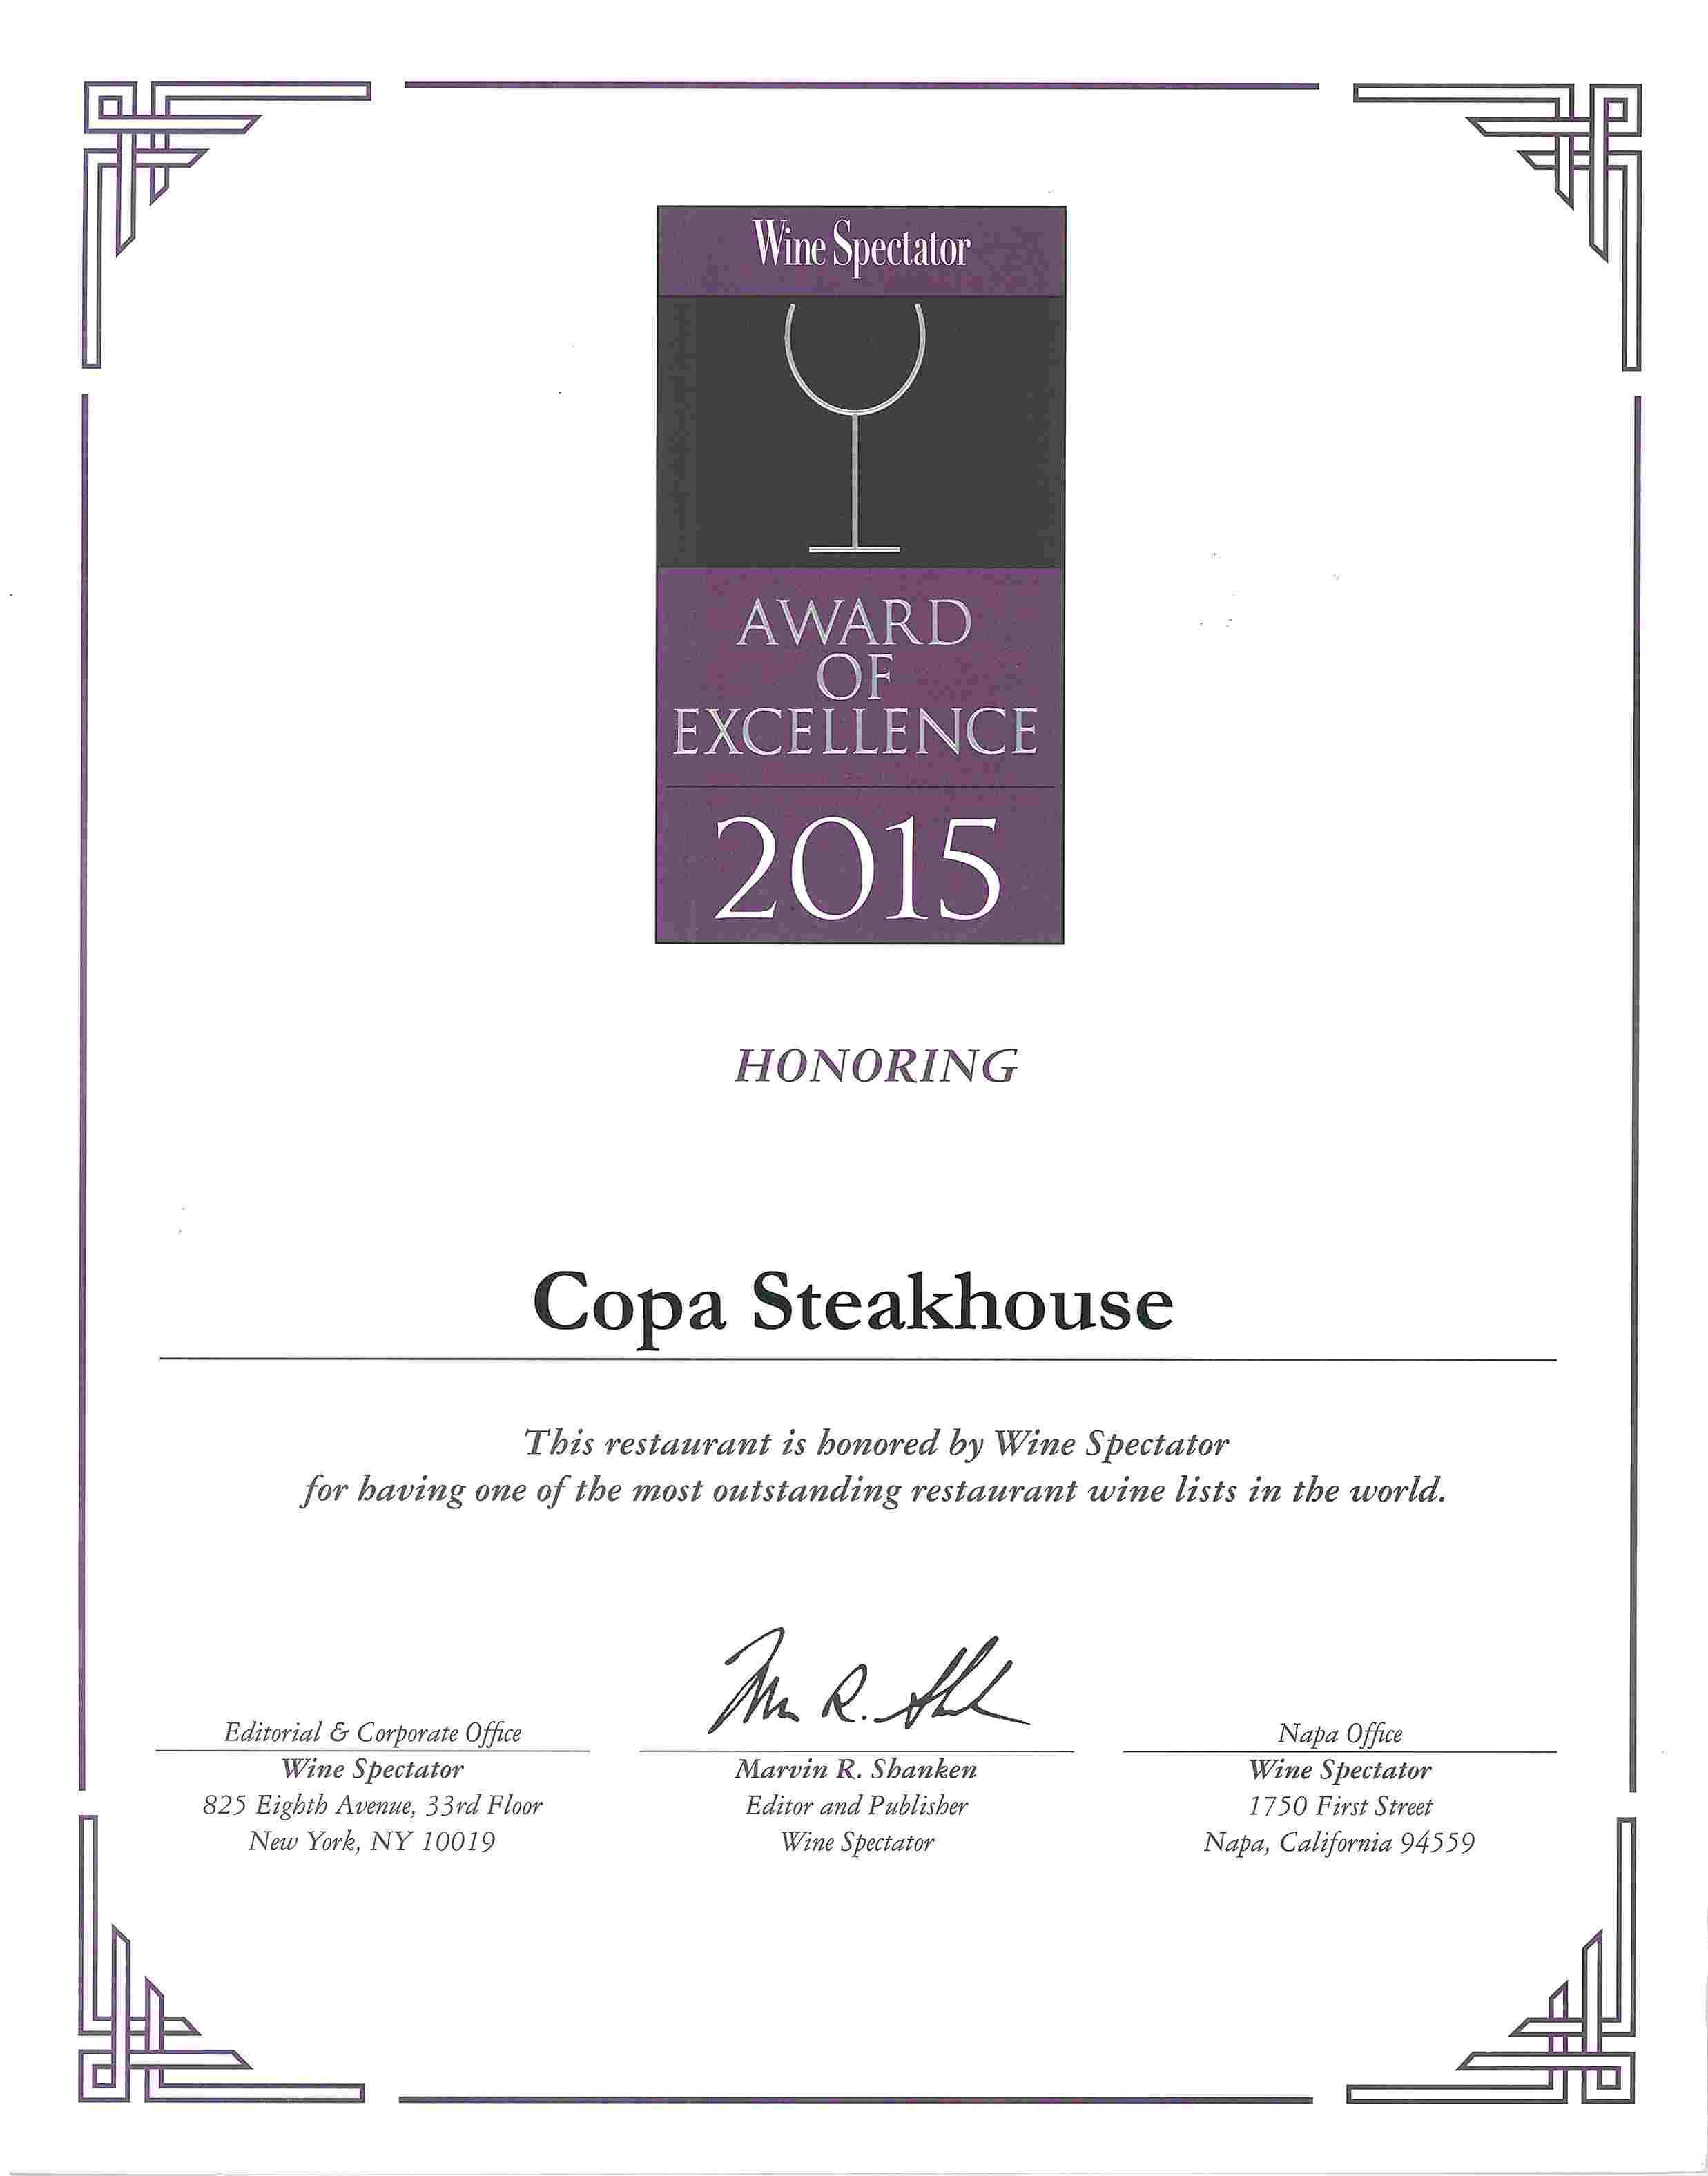 Copa Steakhouse - Wine Spectator List Awards 2015